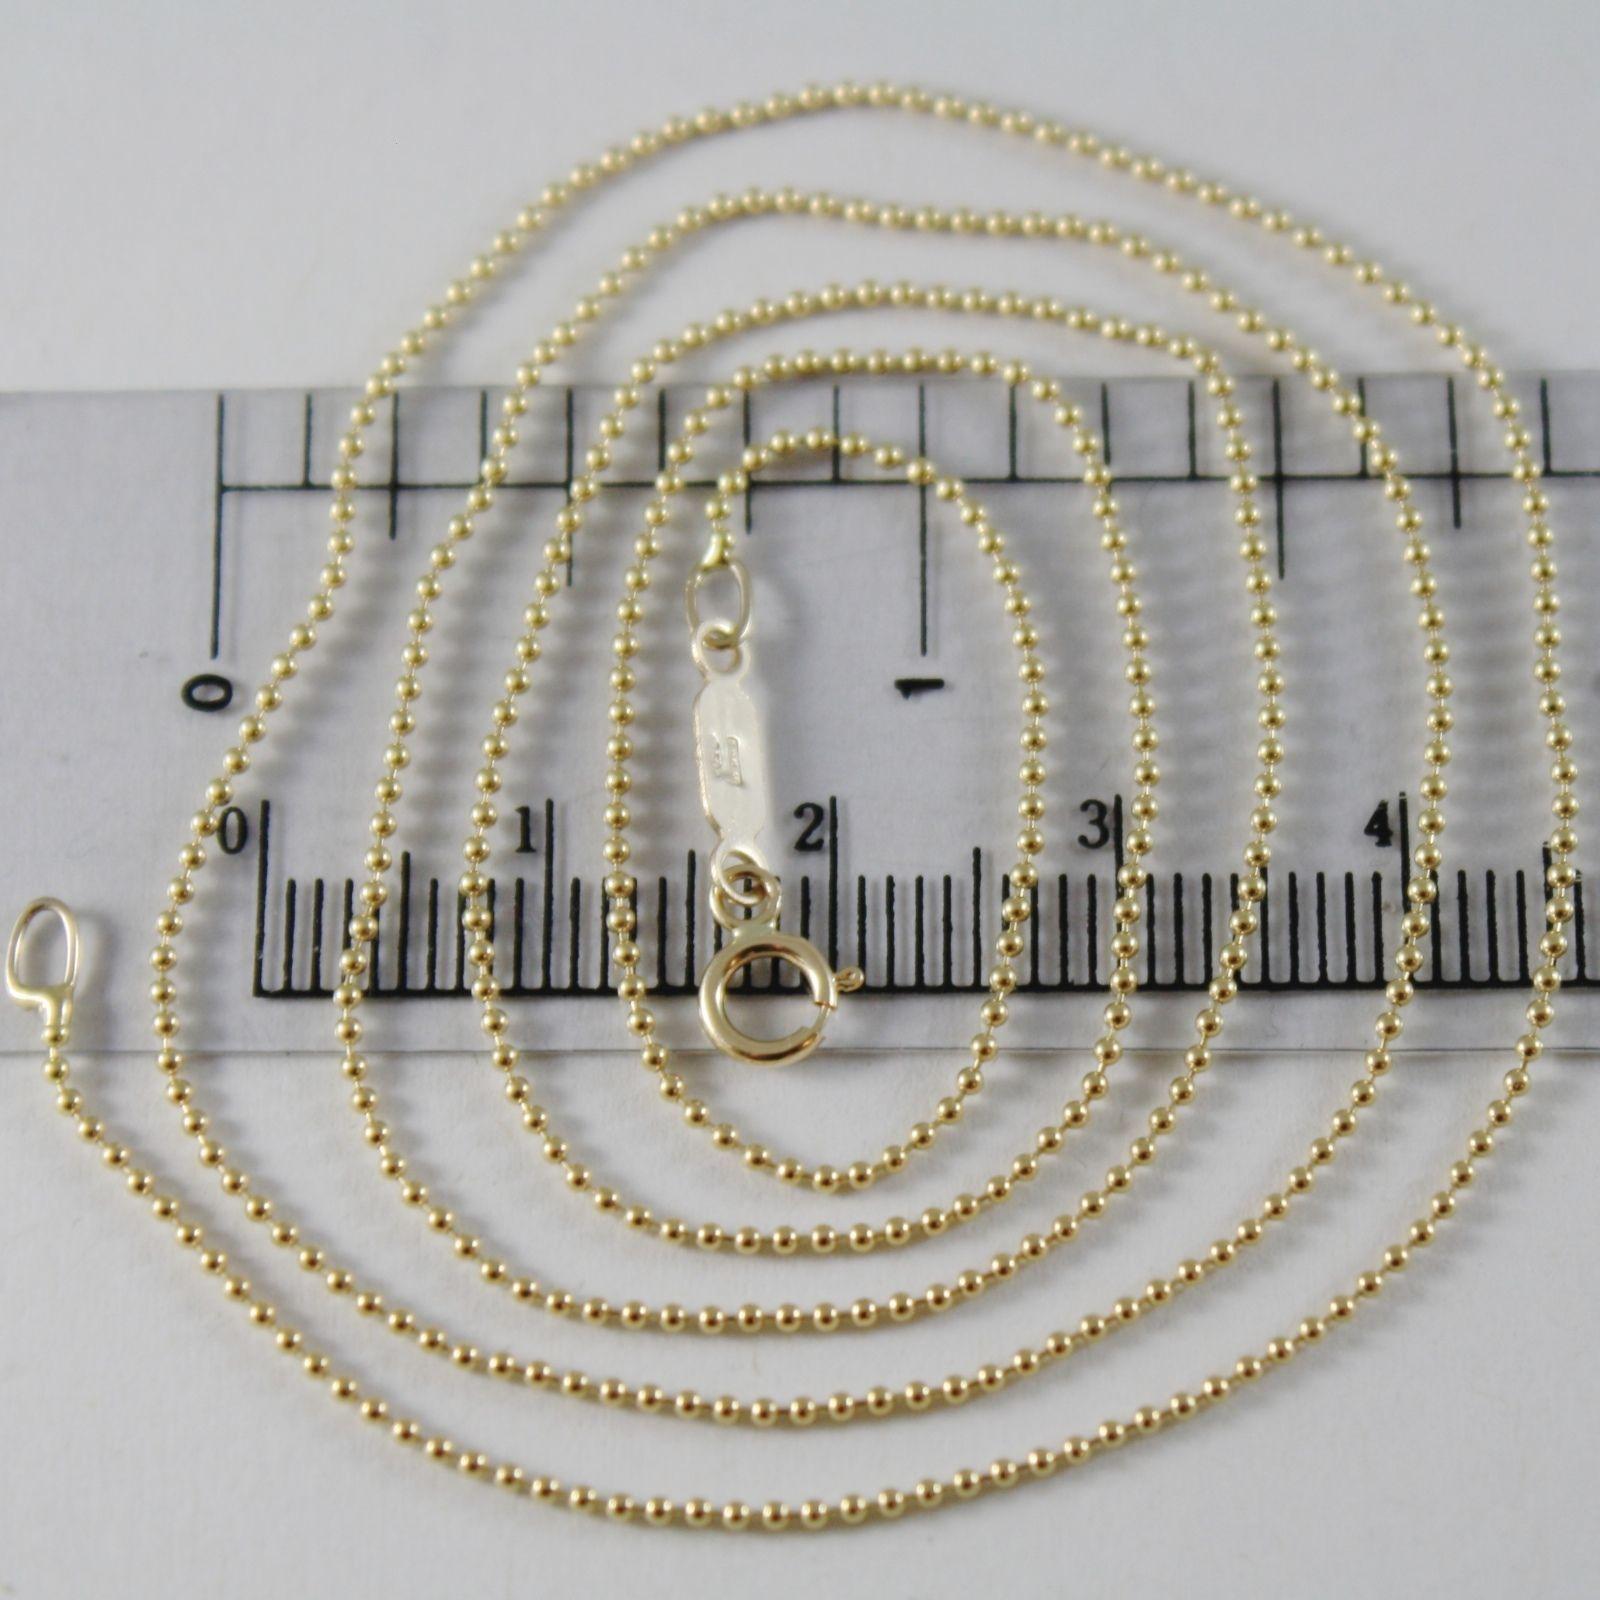 CADENA ORO AMARILLO 750 18 CT MINI BOLAS LÚCIDO LARGO 40 45 50 60 CM ESPESOR 1